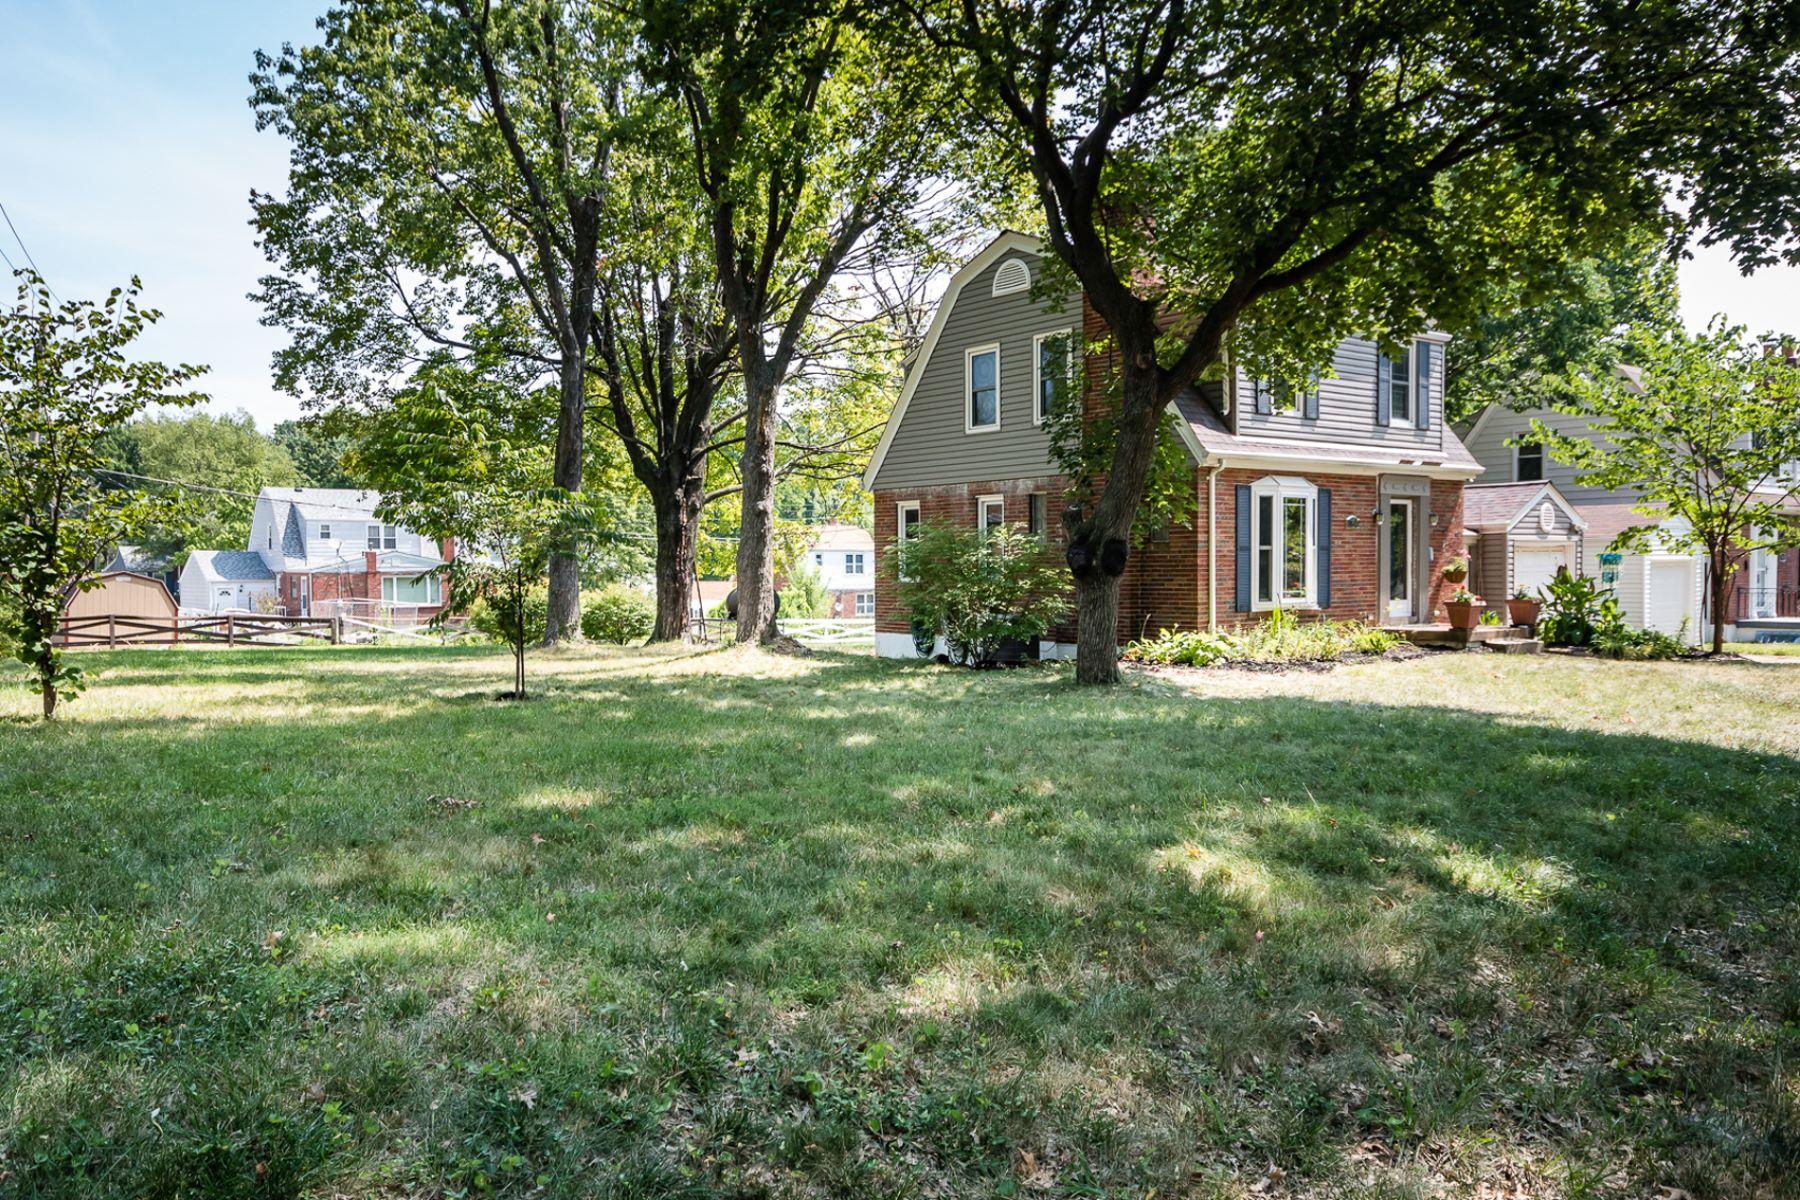 Additional photo for property listing at Hillsdale Dr 7549 Hillsdale Dr Greendale, 密苏里州 63121 美国